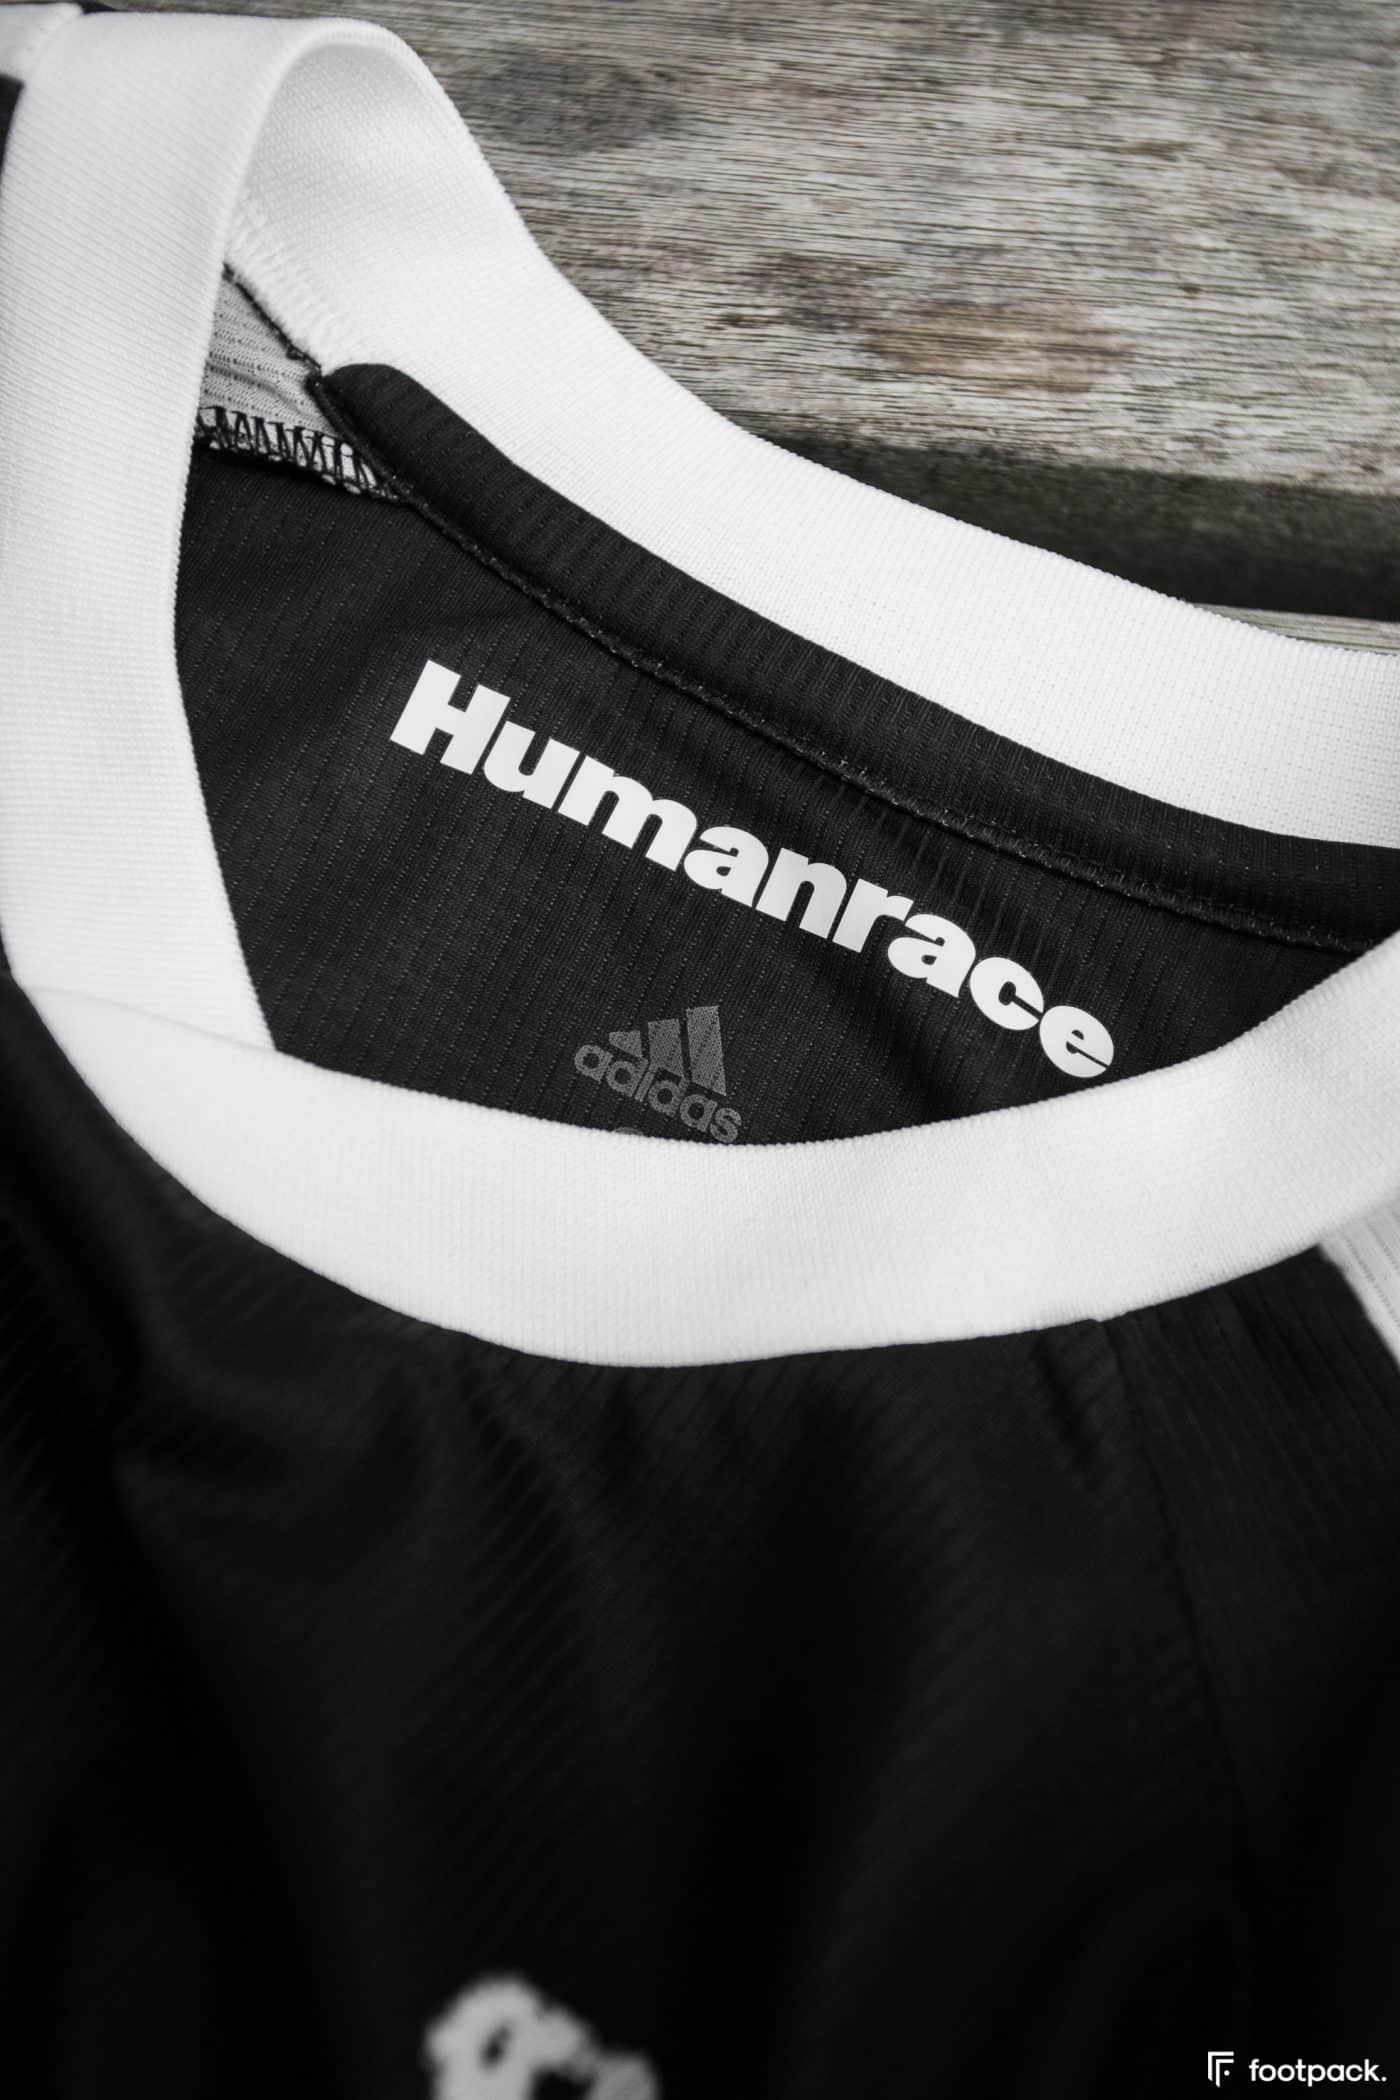 maillot-real-madrid-adidas-humanrace-footpack-8